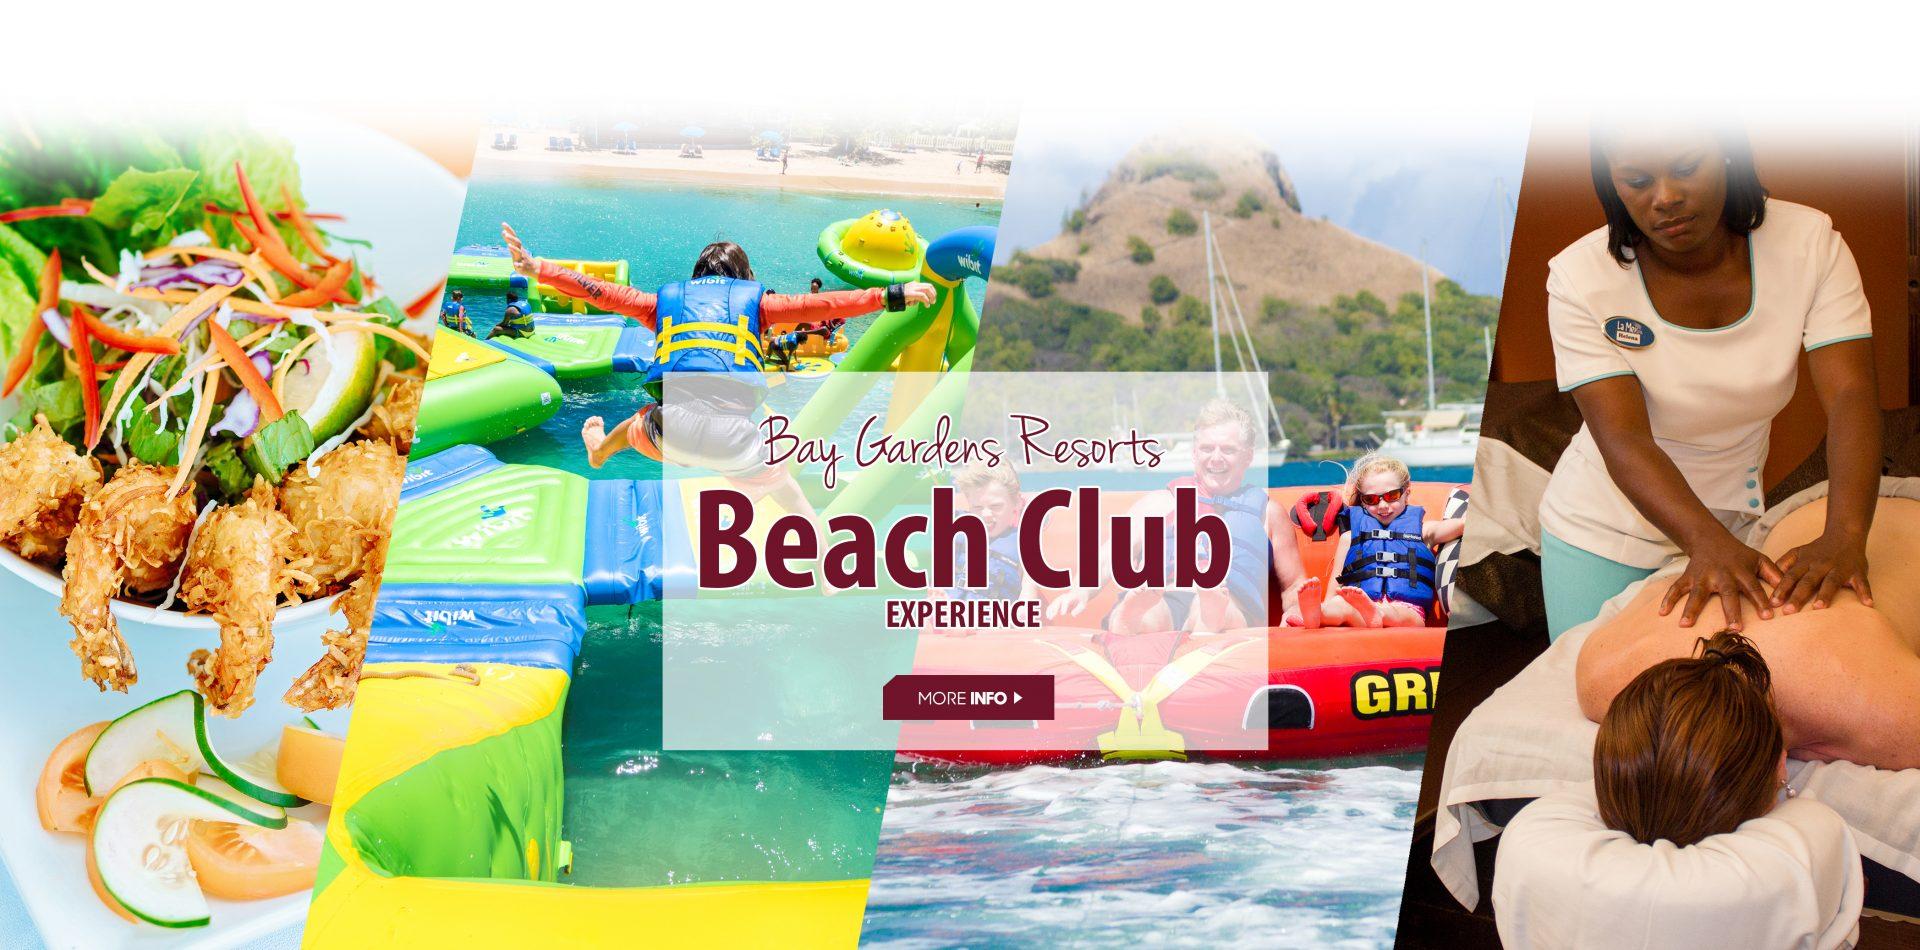 AllInclusive Resort in St Lucia Bay Gardens Resorts